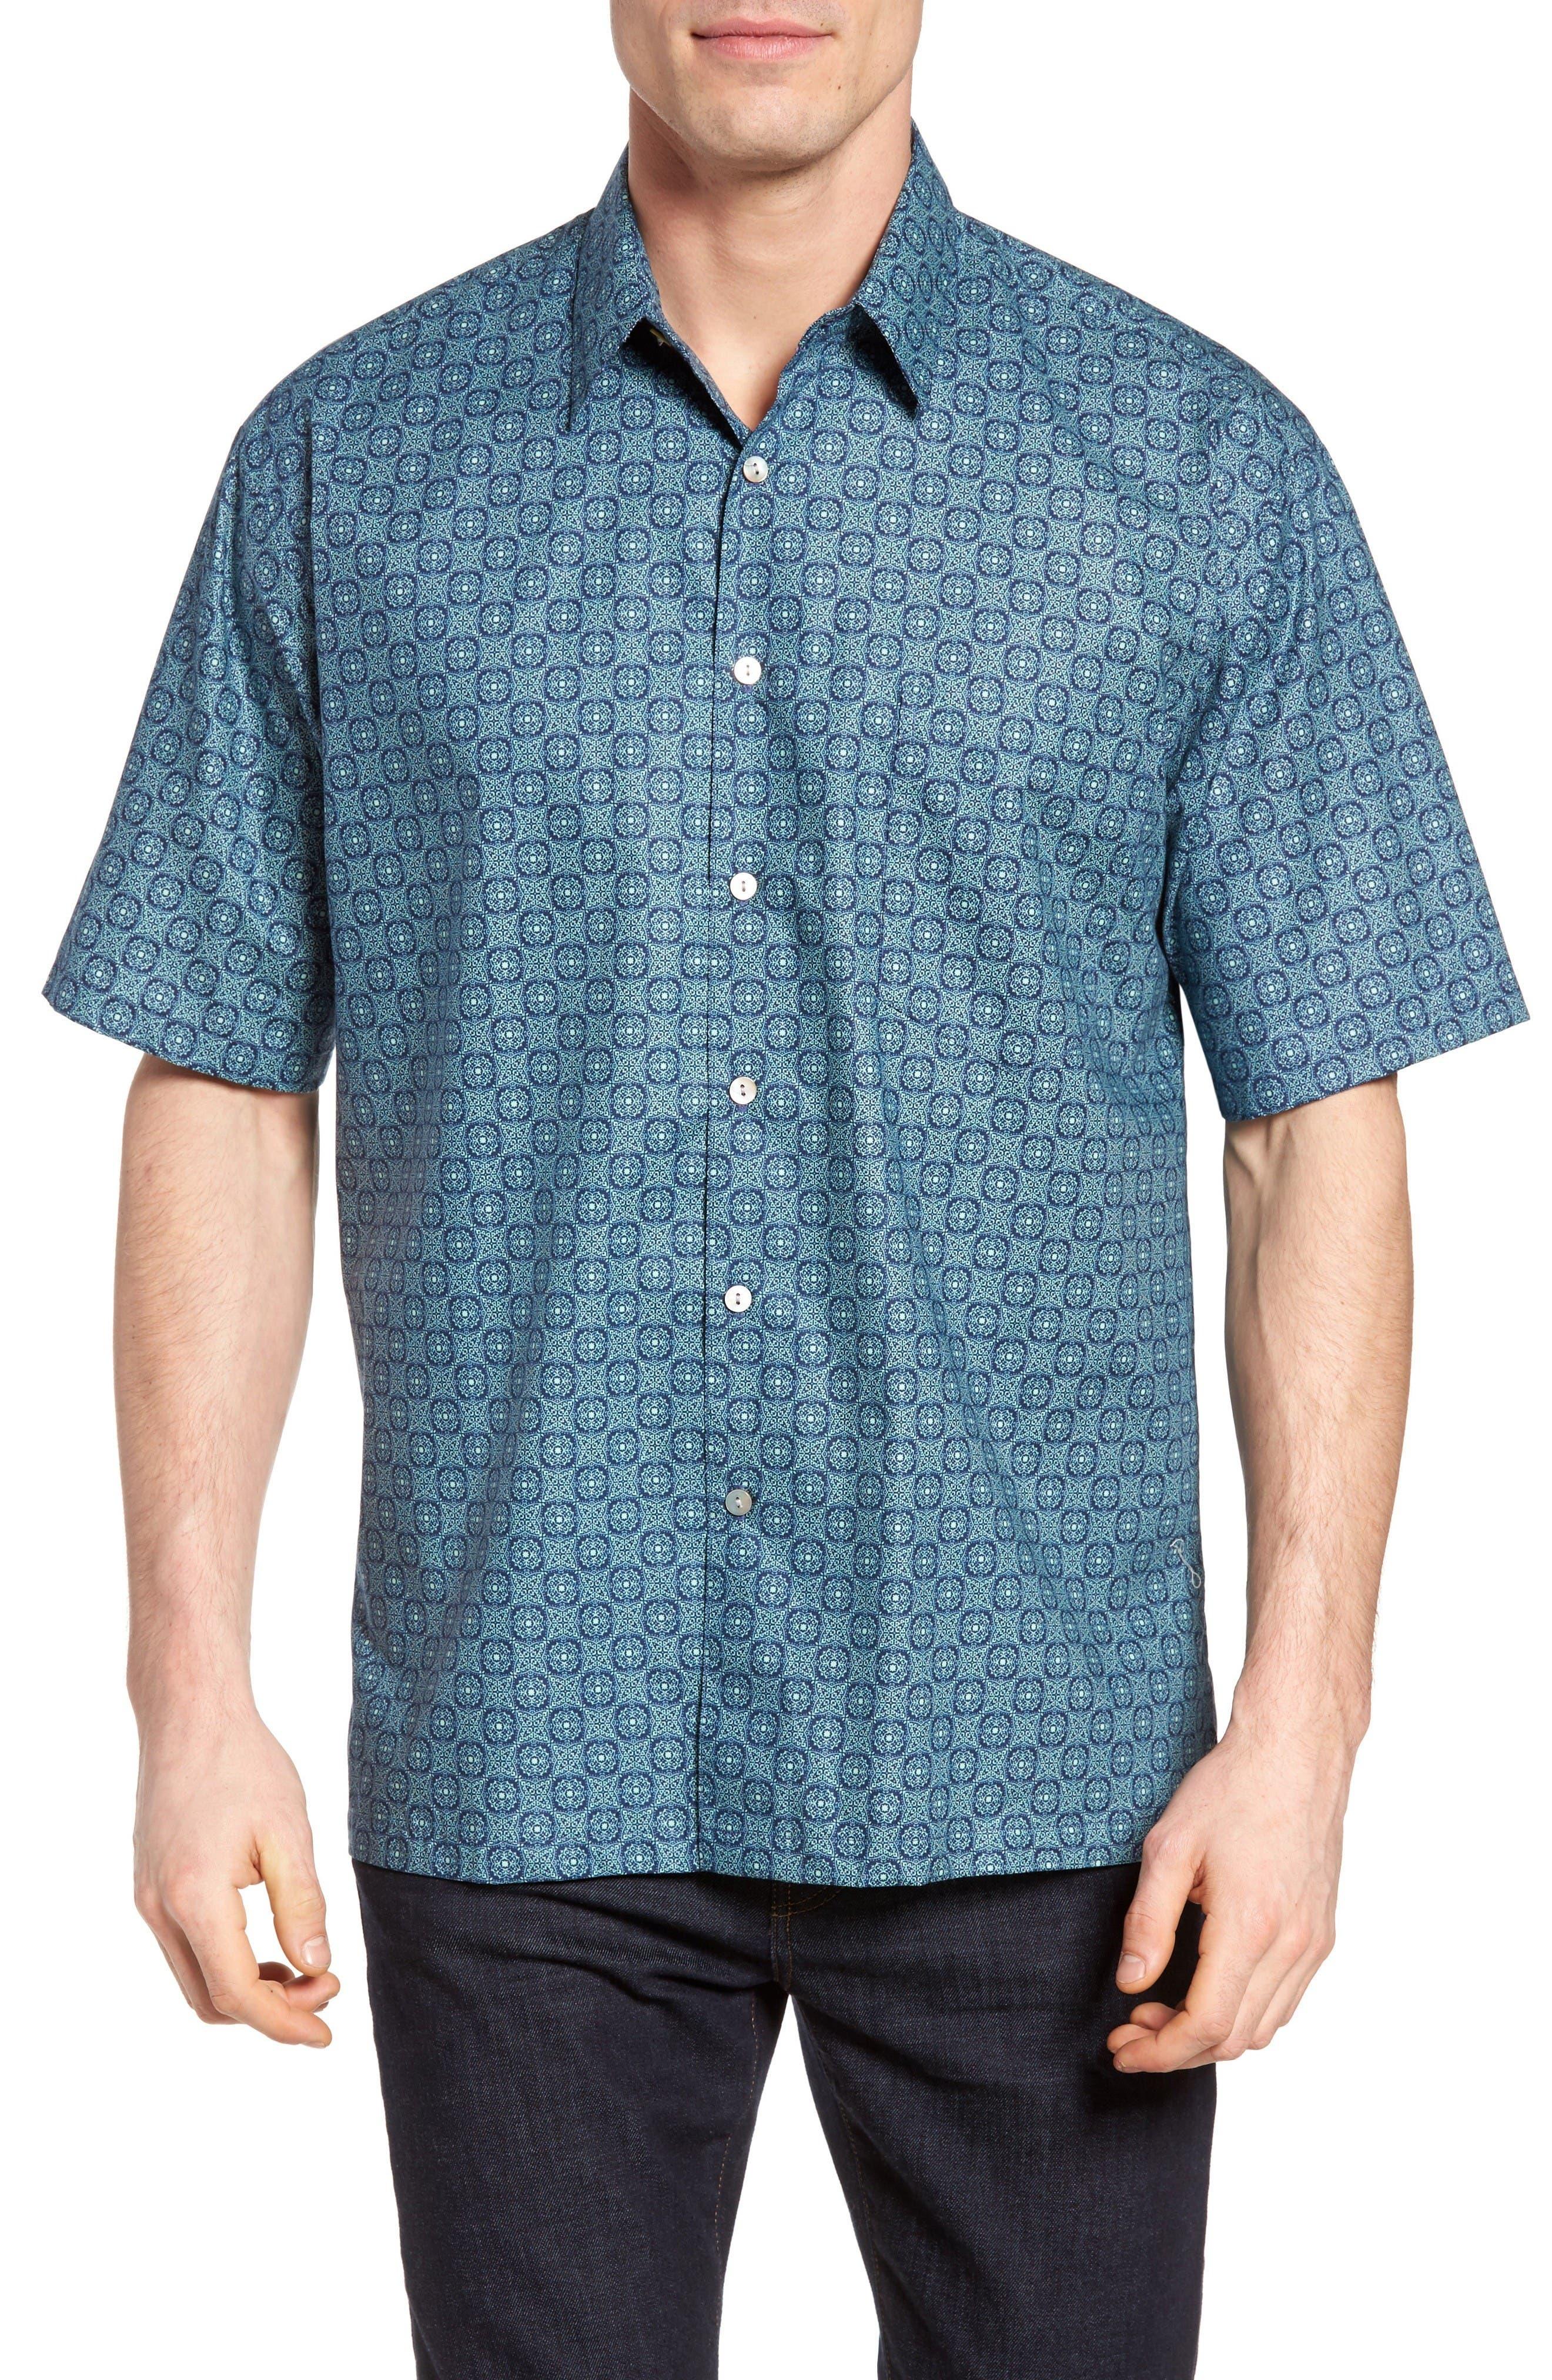 Tori Richard 'Atom' Regular Fit Cotton Lawn Sport Shirt